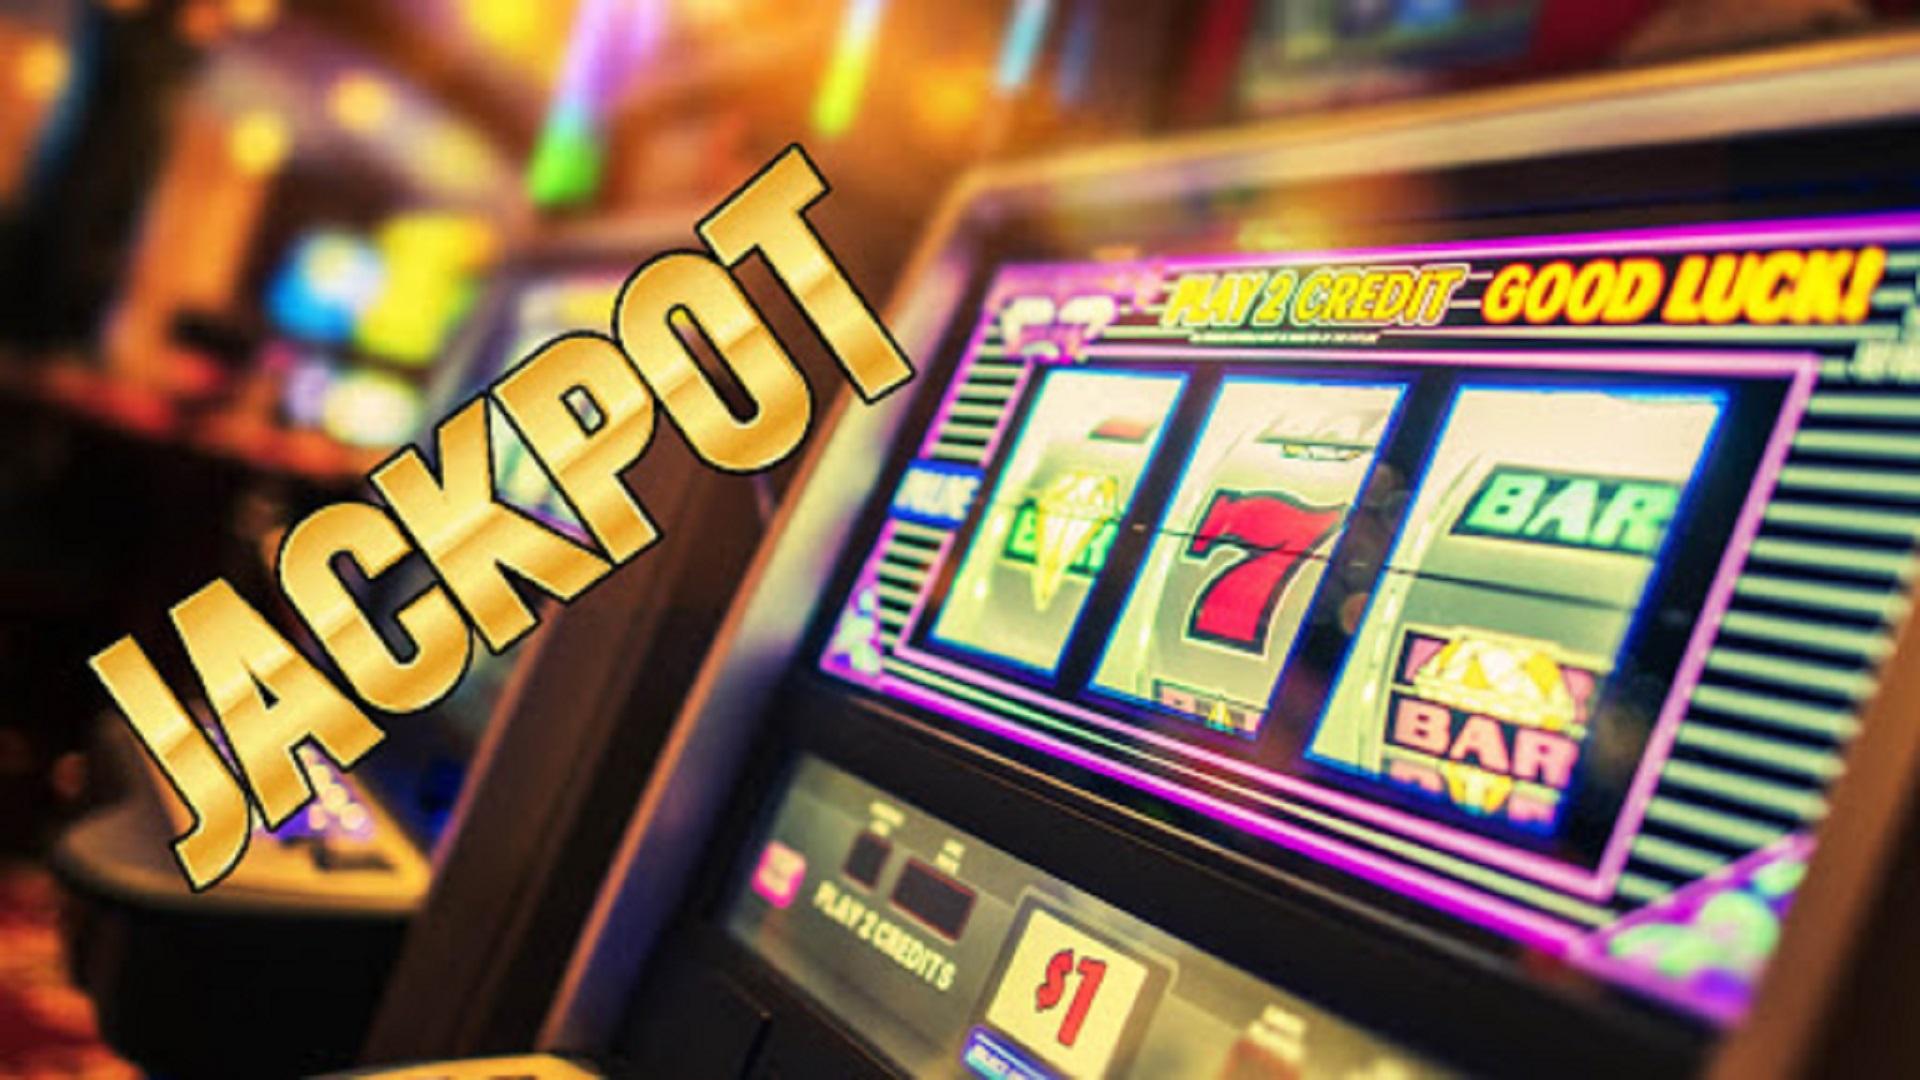 Langkah Meningkatkan Peluang Kemengan Bermain Slot Online